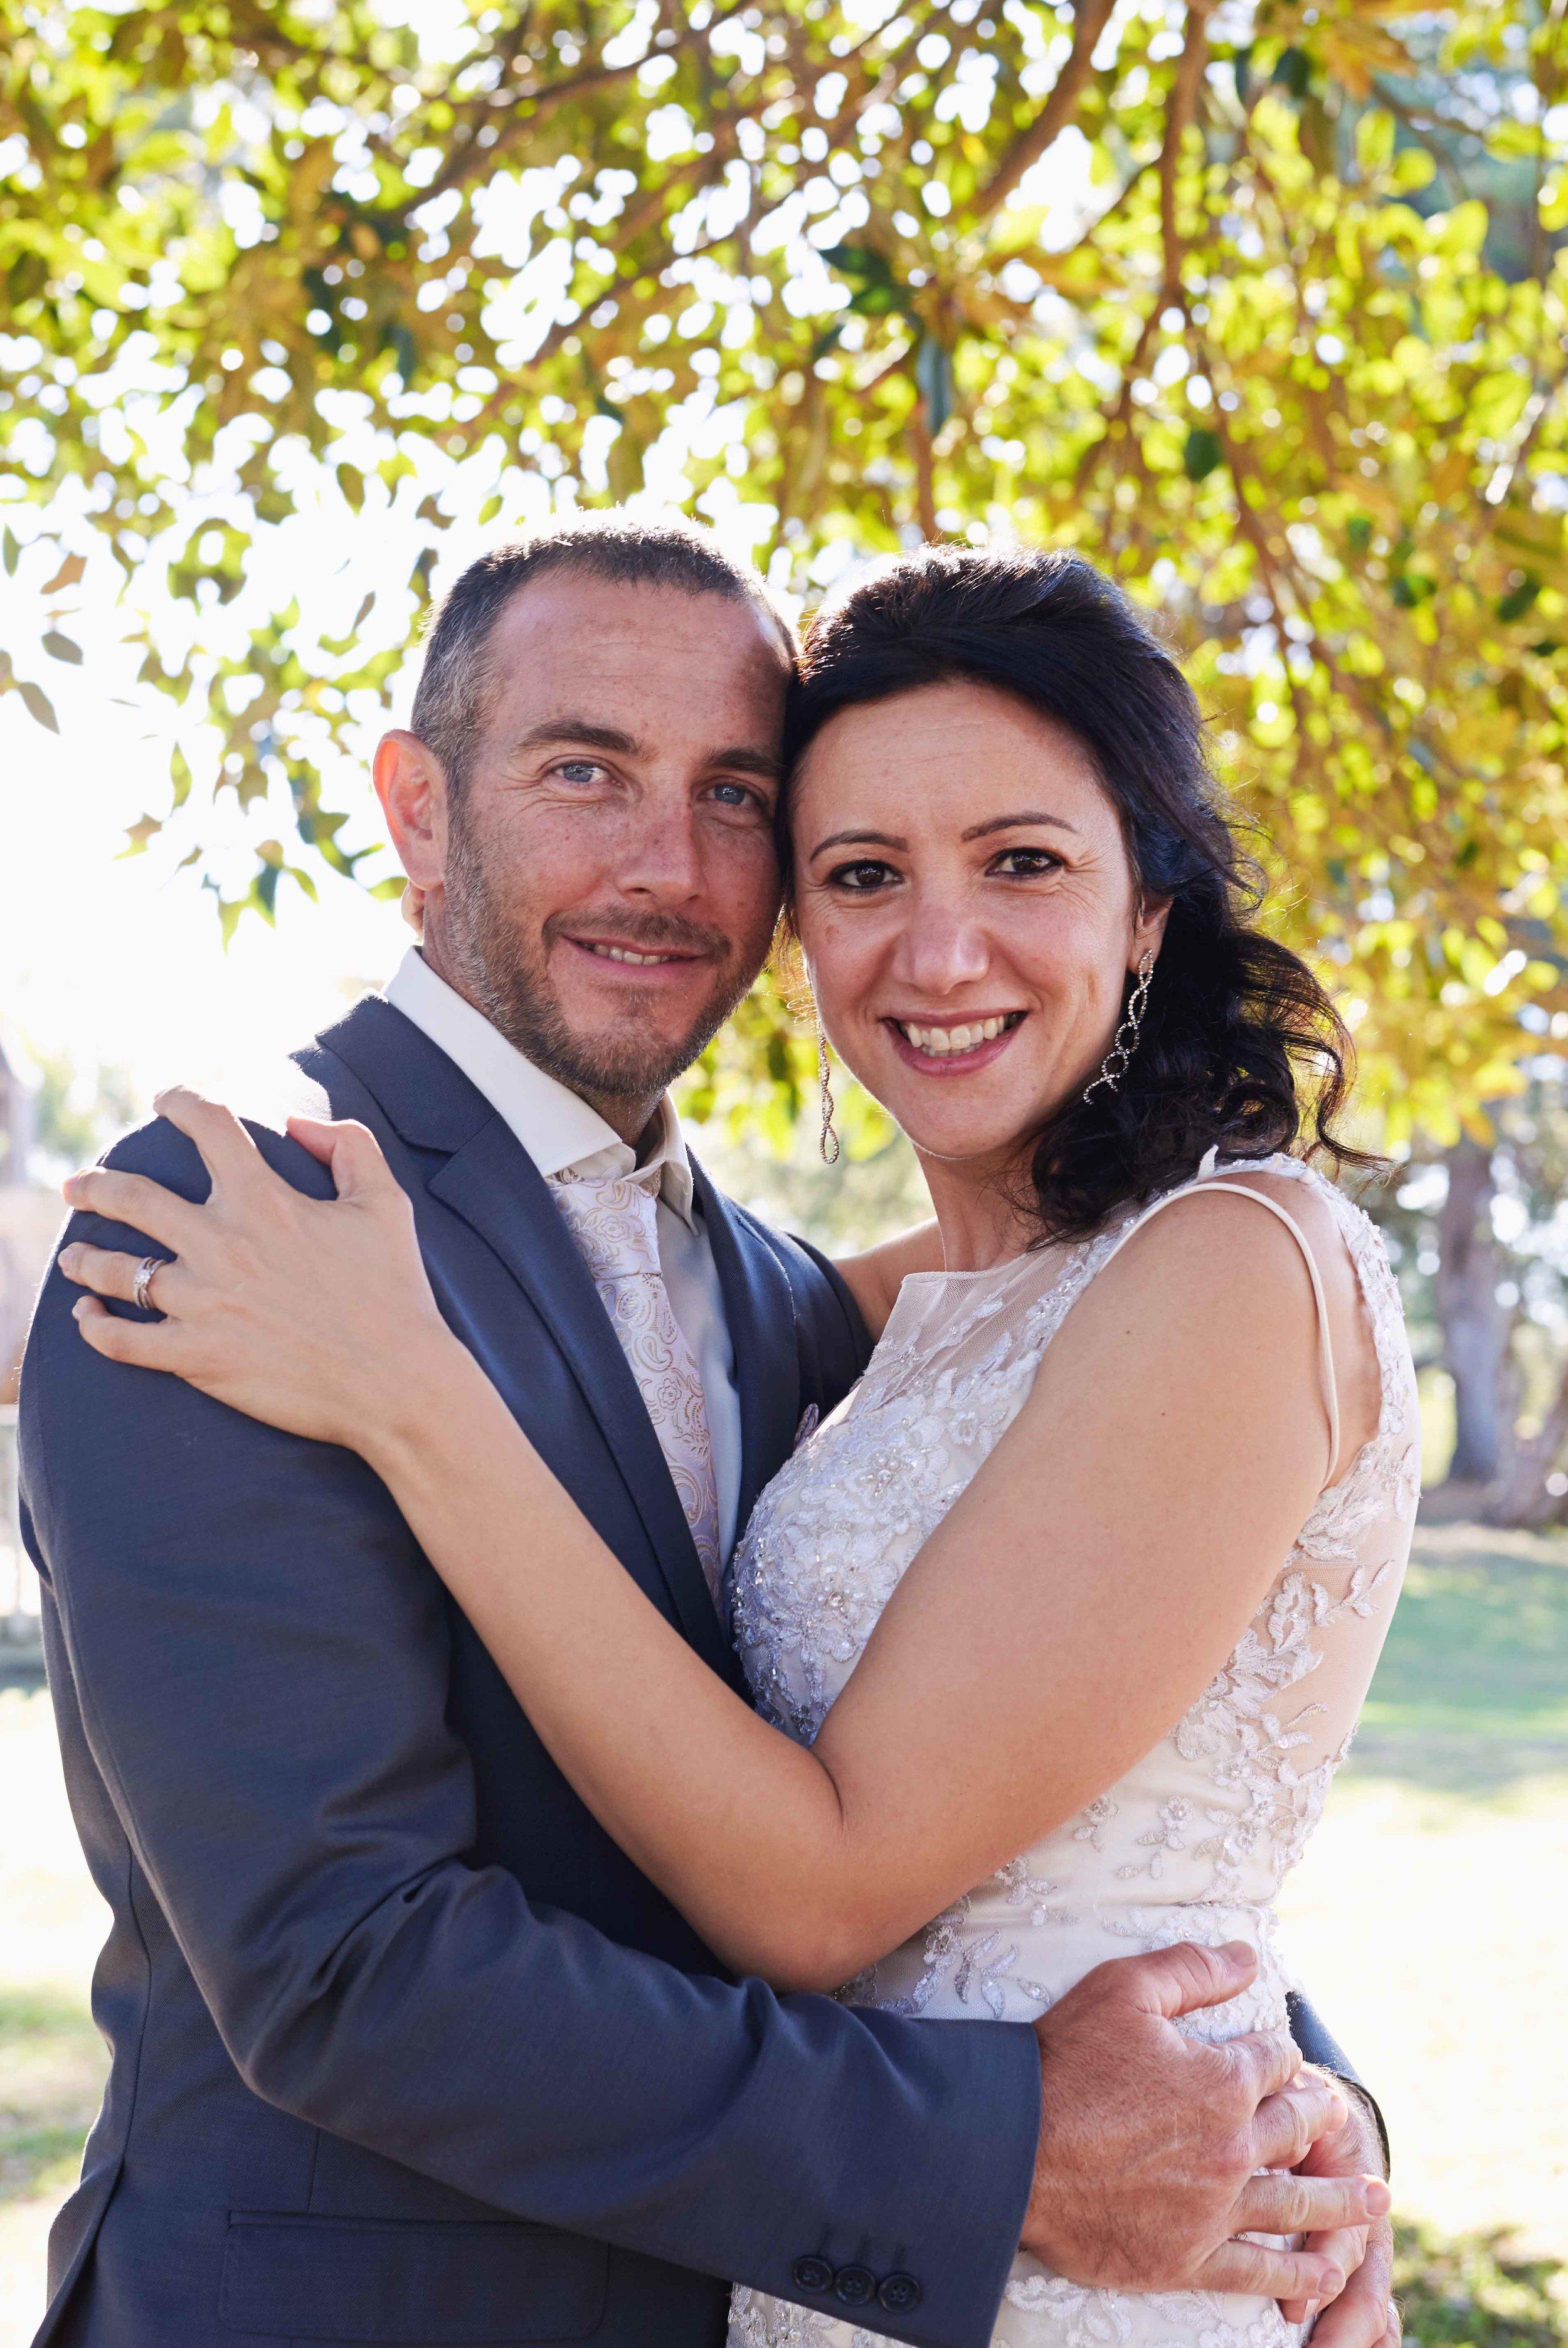 sorrento-wedding-photography-all-smiles-marissa-jade-photography-156.jpg